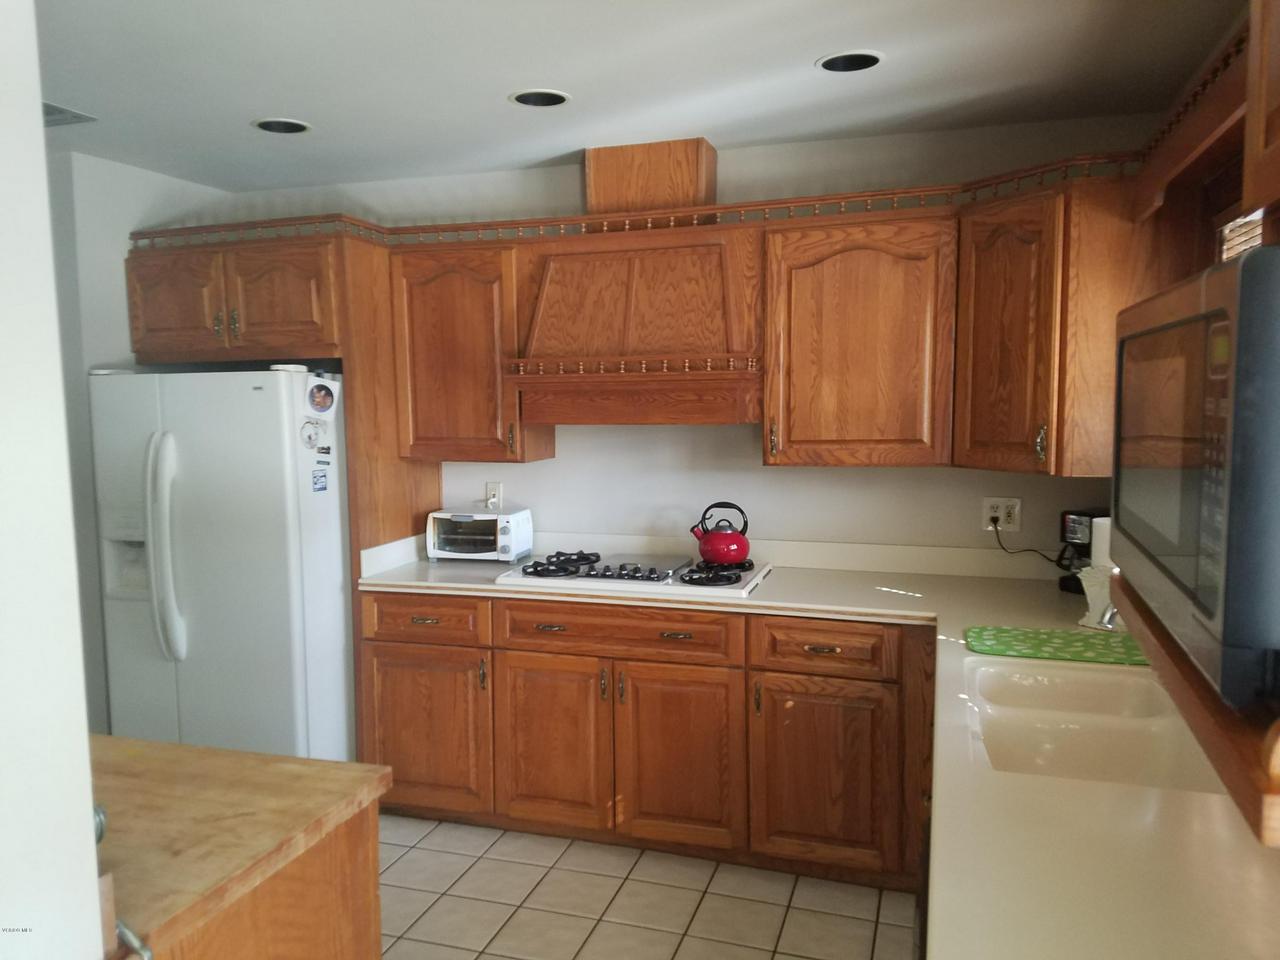 10720 TERNEZ, Moorpark, CA 93021 - Kitchen 2